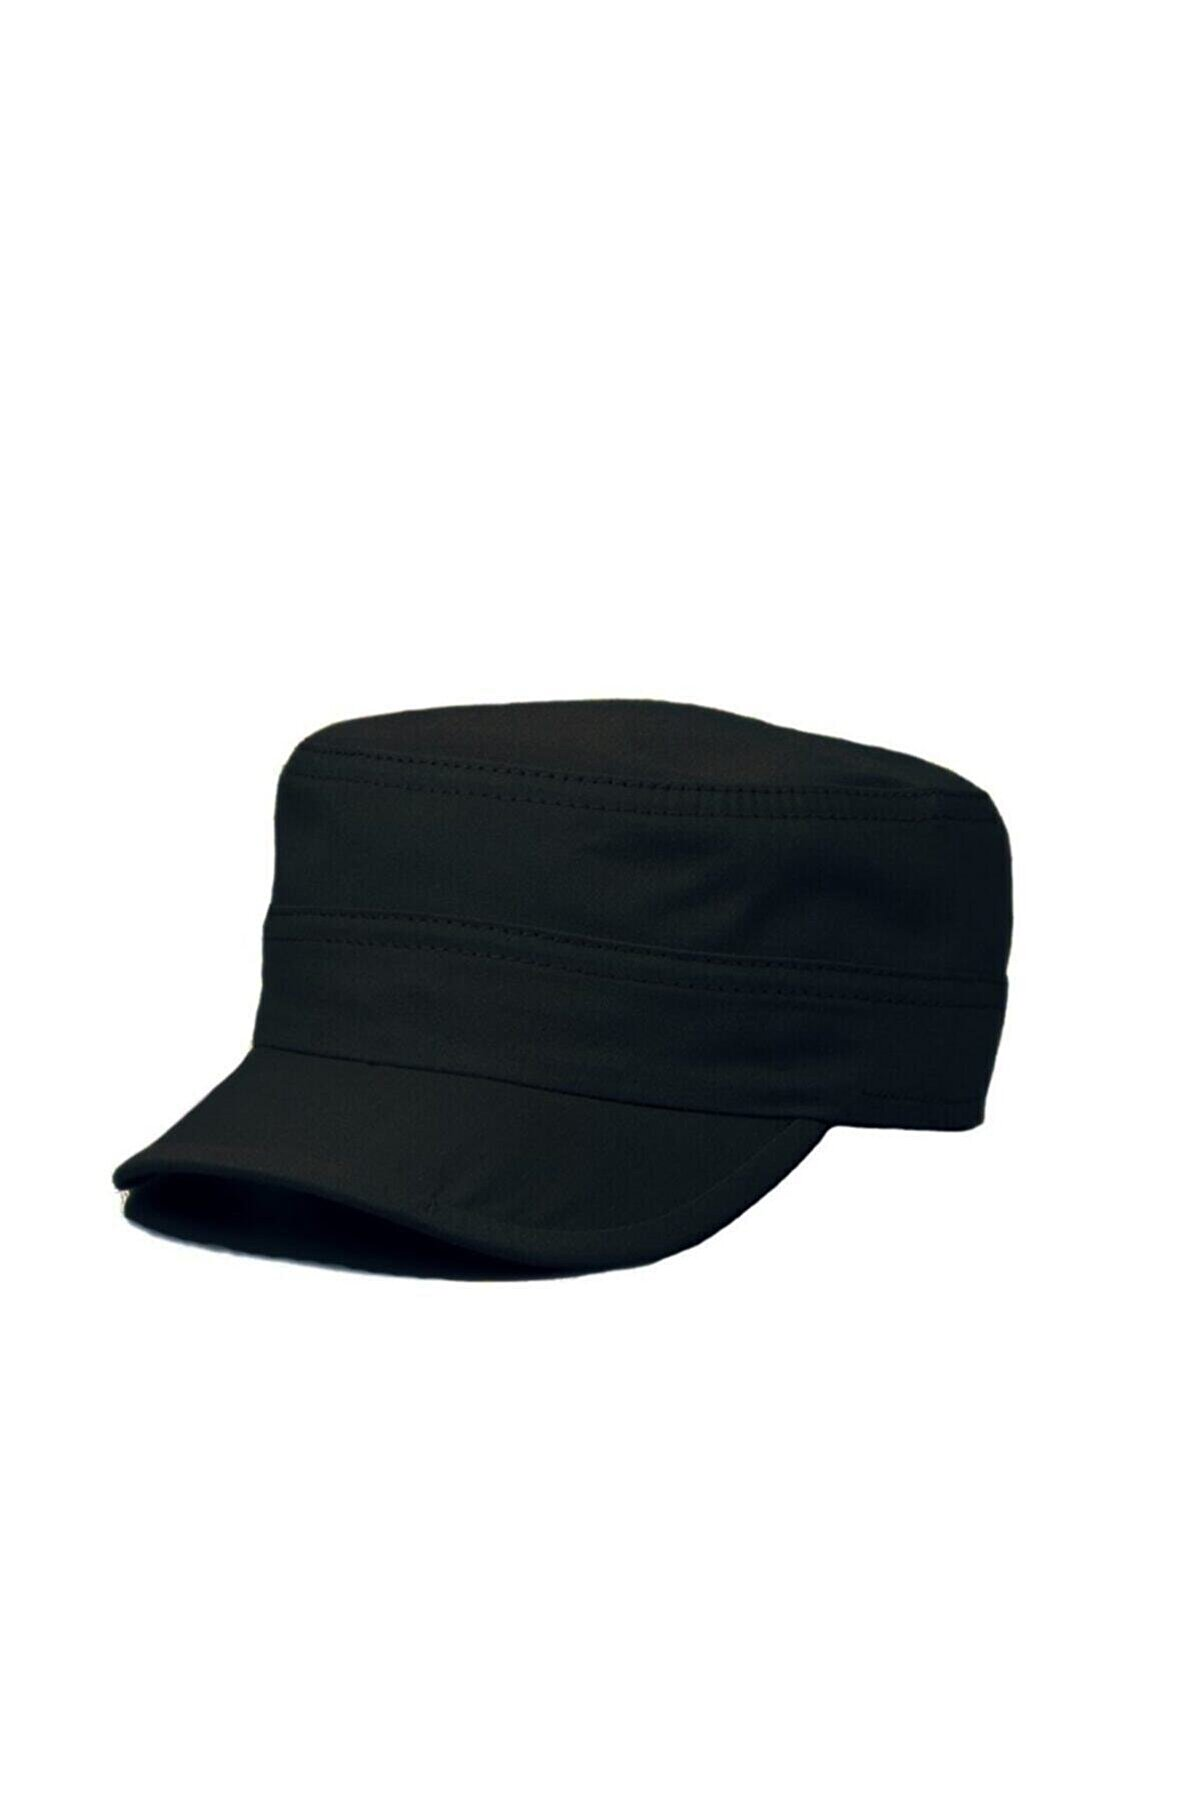 ERASTORE Siyah Castro Askeri Model Cap Şapka